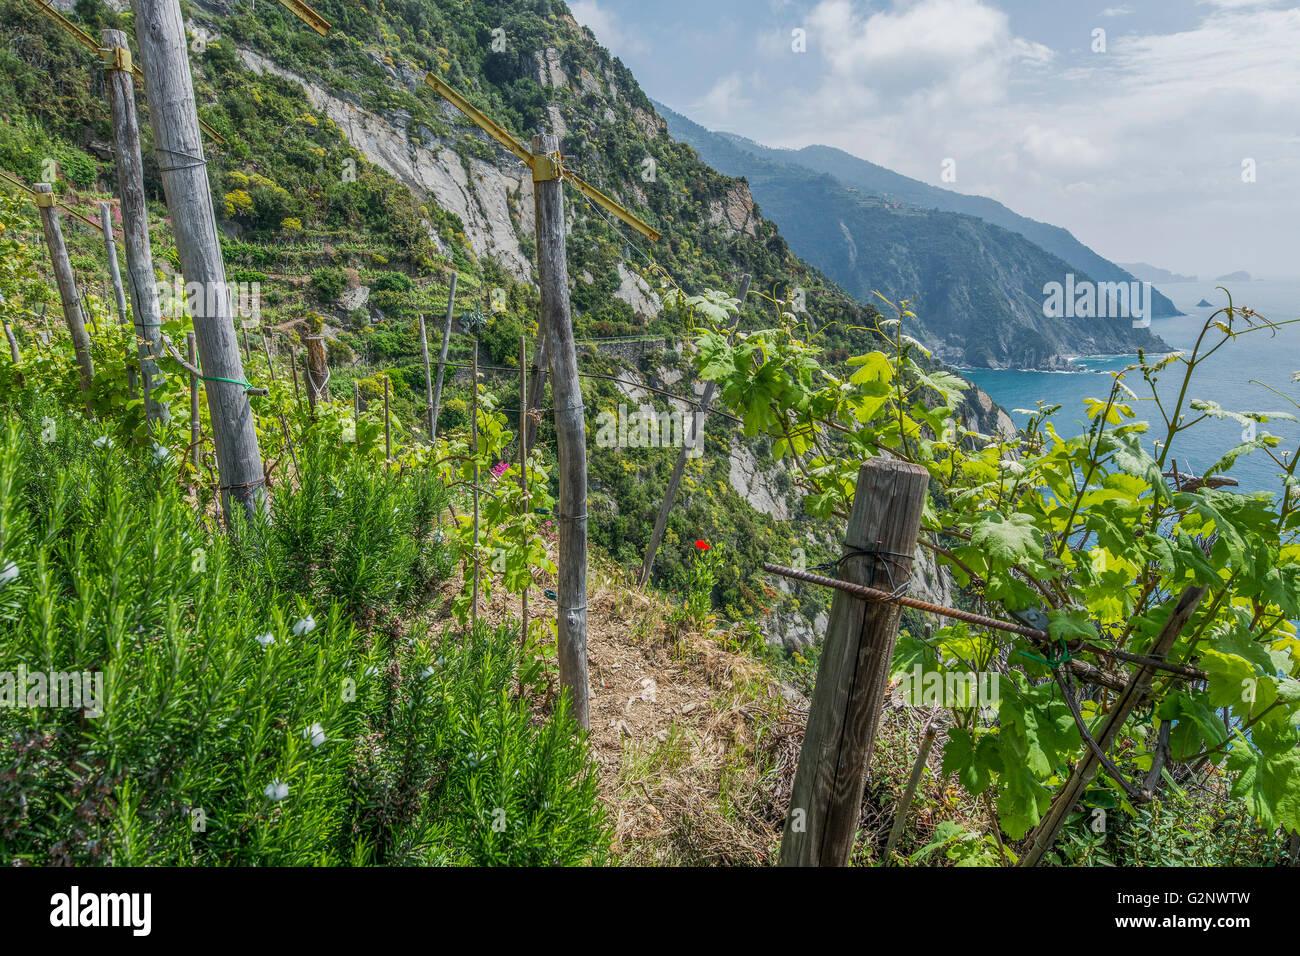 https://c8.alamy.com/comp/G2NWTW/viticultural-terraces-of-riomaggiore-near-la-spezia-liguria-G2NWTW.jpg